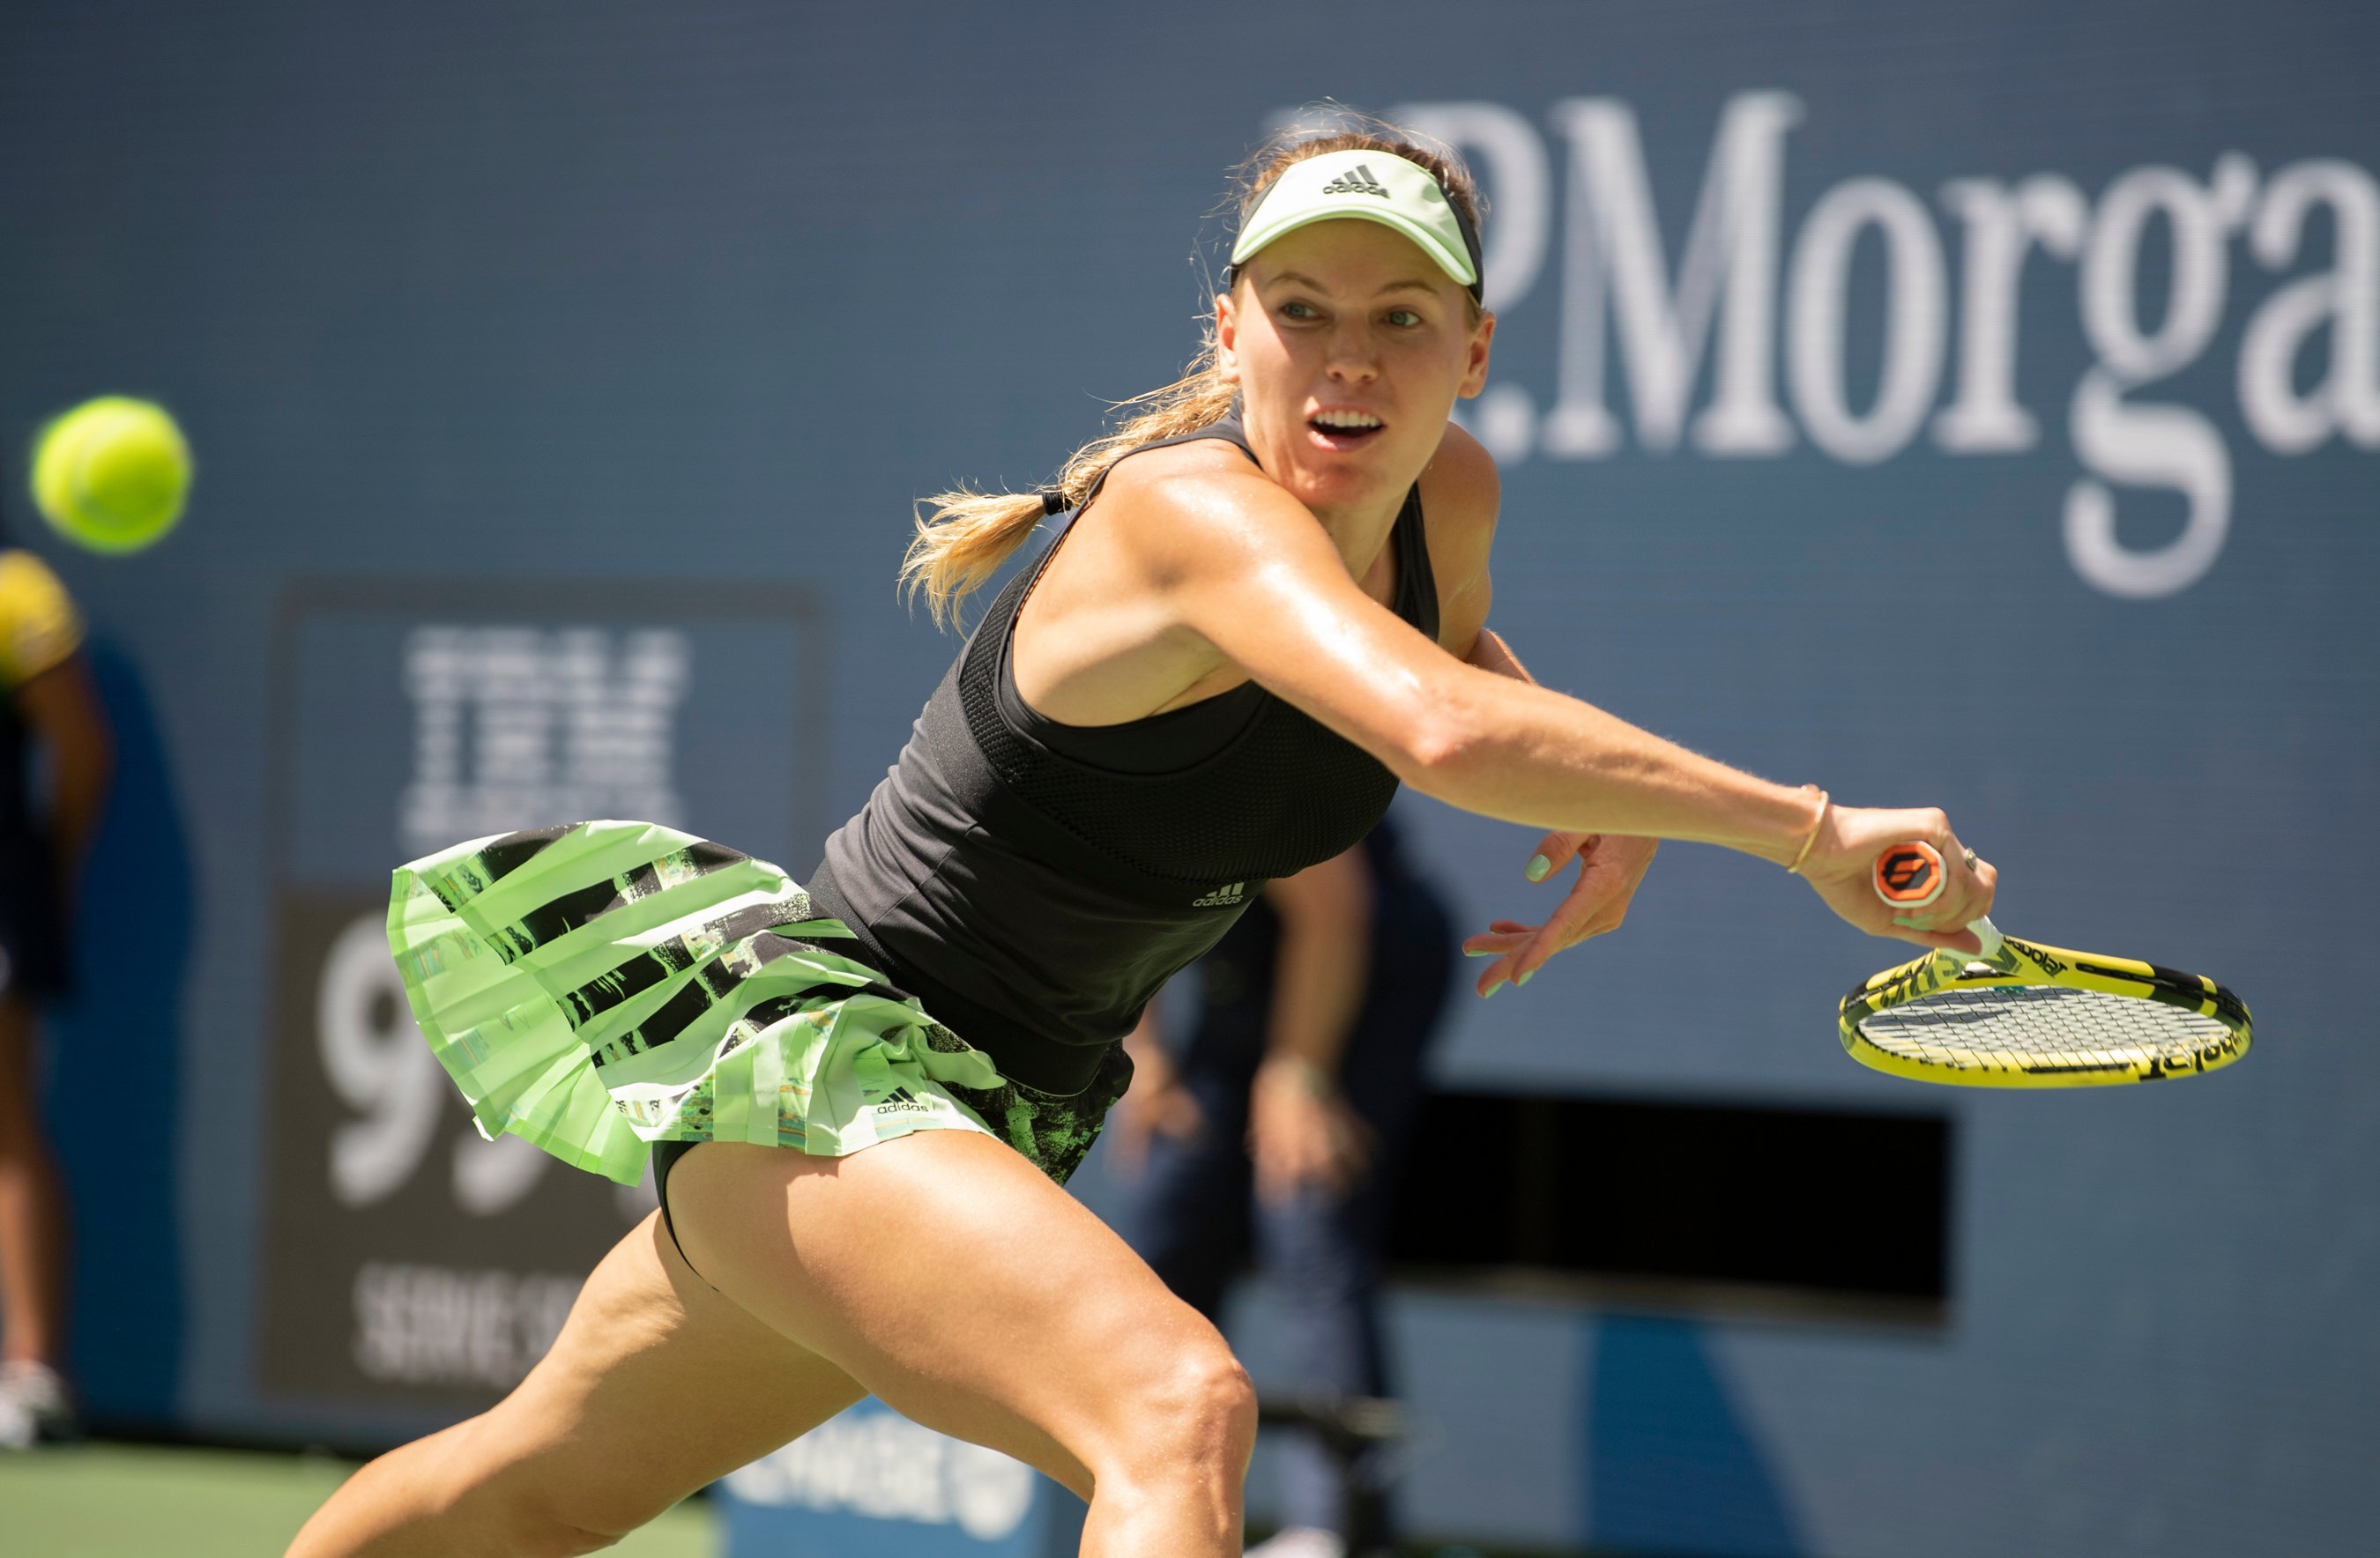 Danish tennis star Caroline Wozniacki prepares for an emotional farewell ahead of retirement from professional tennis after Australian Open 2020